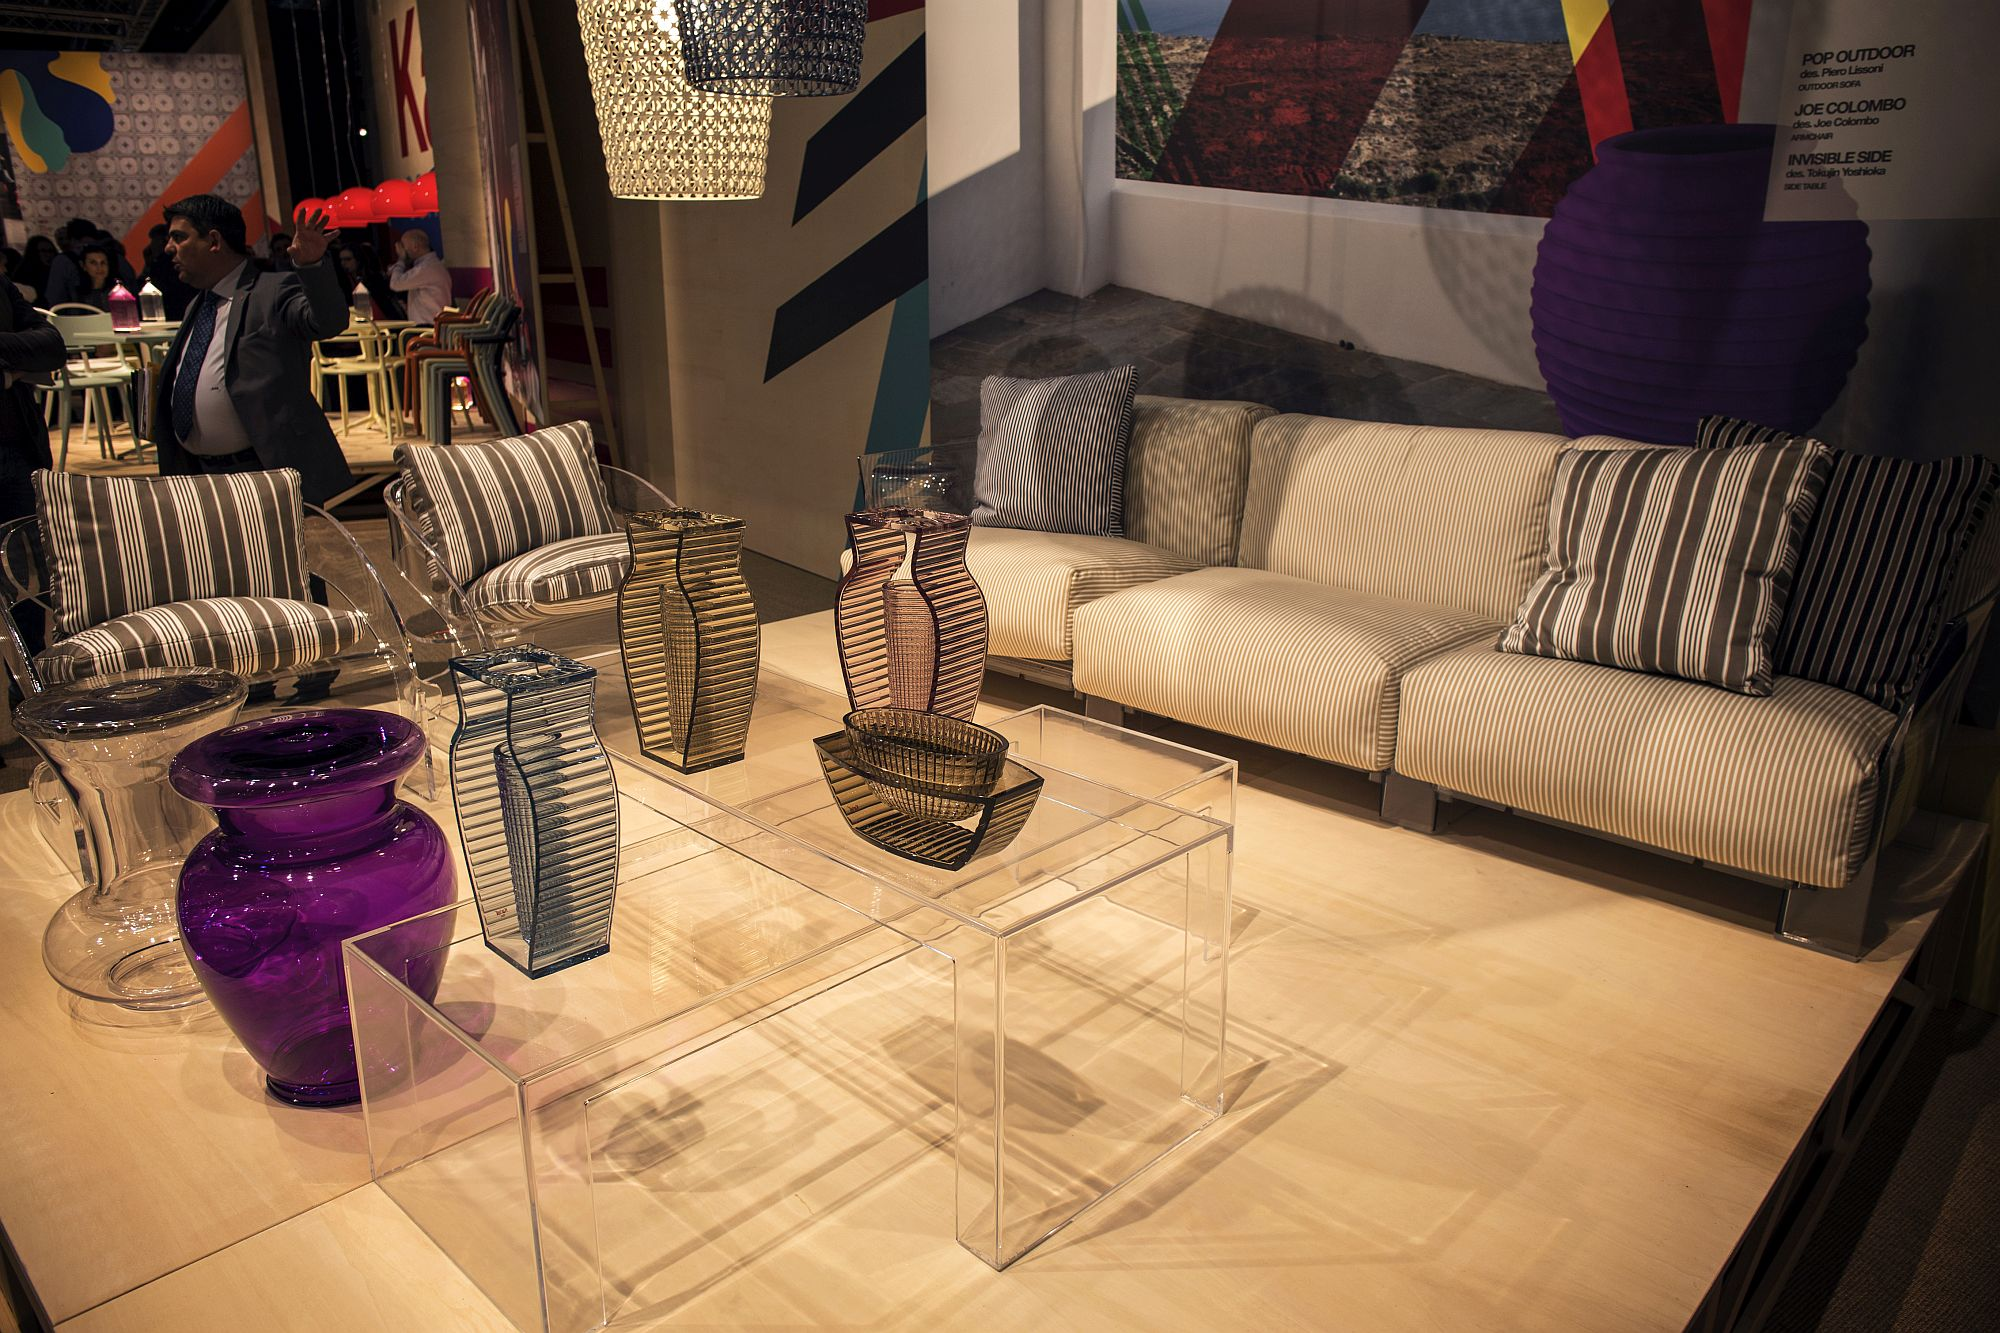 Acrylic-coffee-tables-bring-visual-lightness-to-living-room